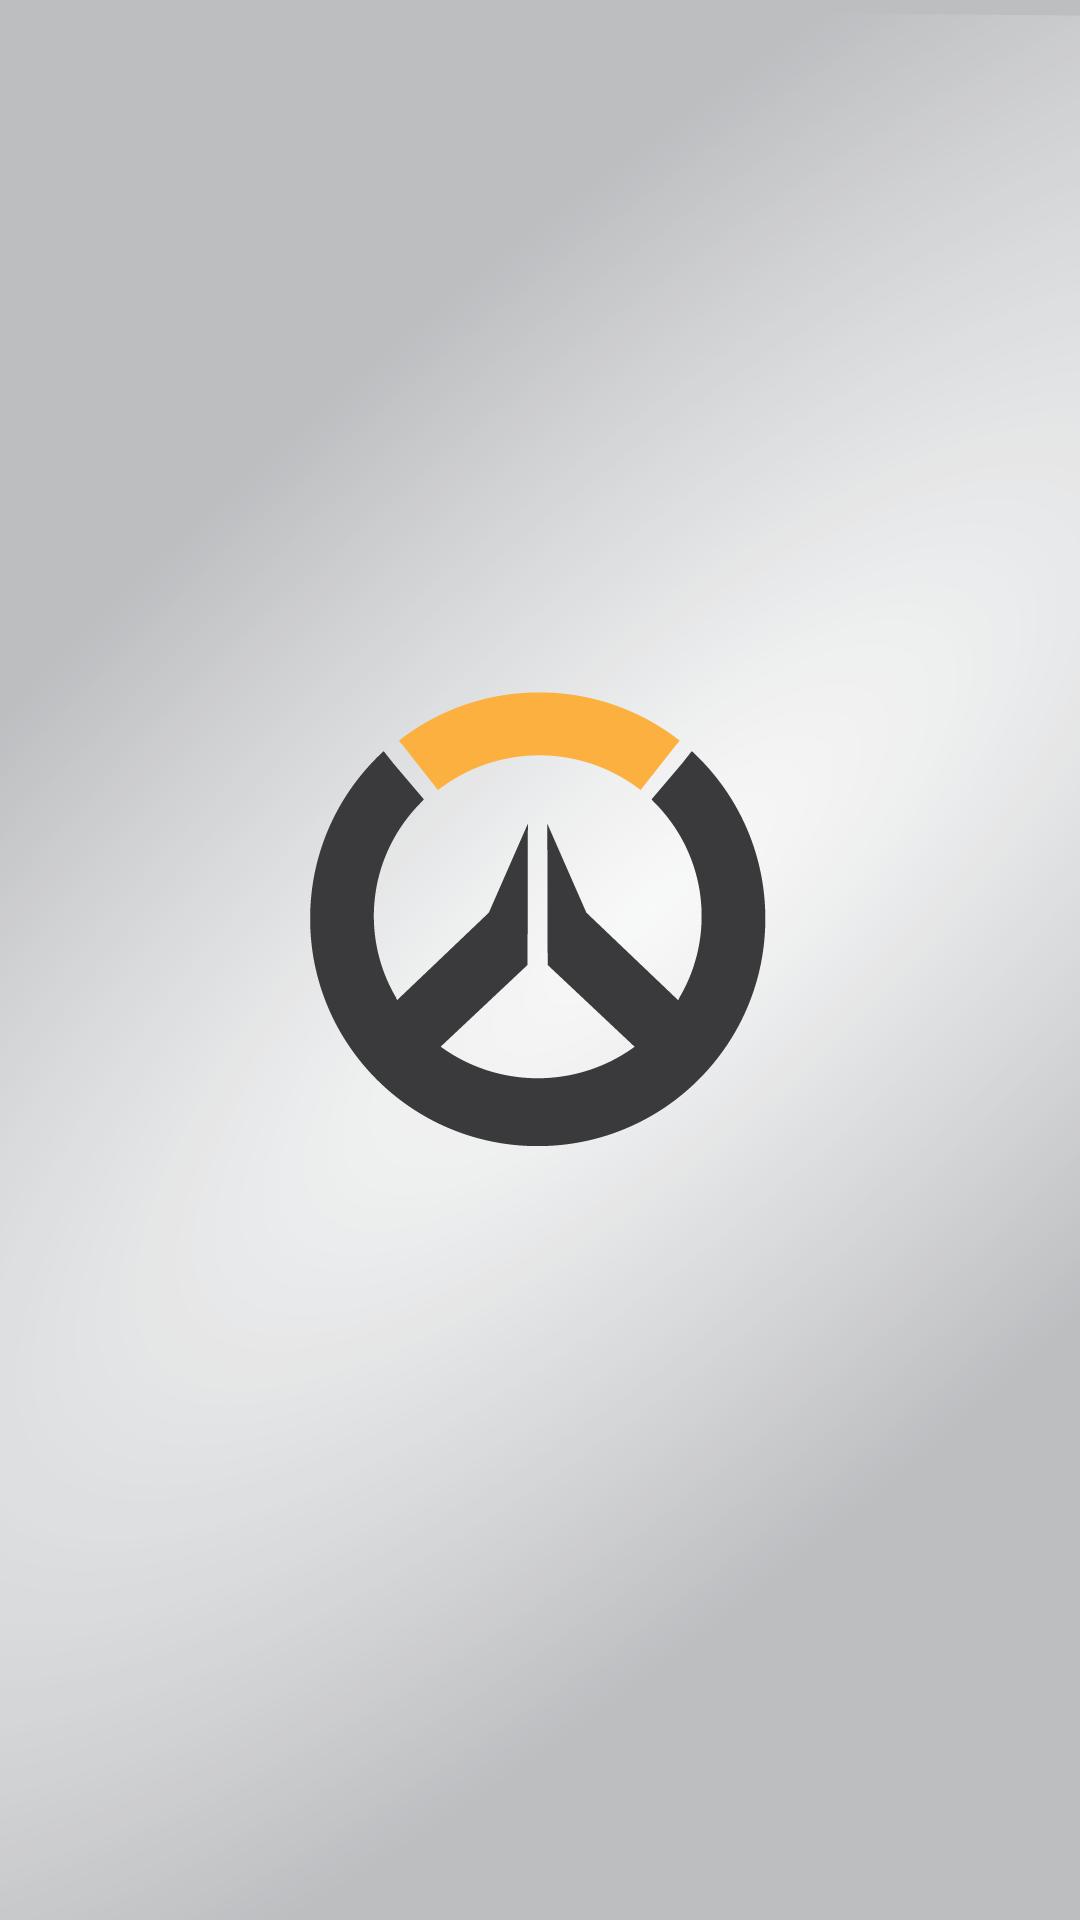 Overwatch iPhone wallpaper – Simple, Yet Amazingly Functional